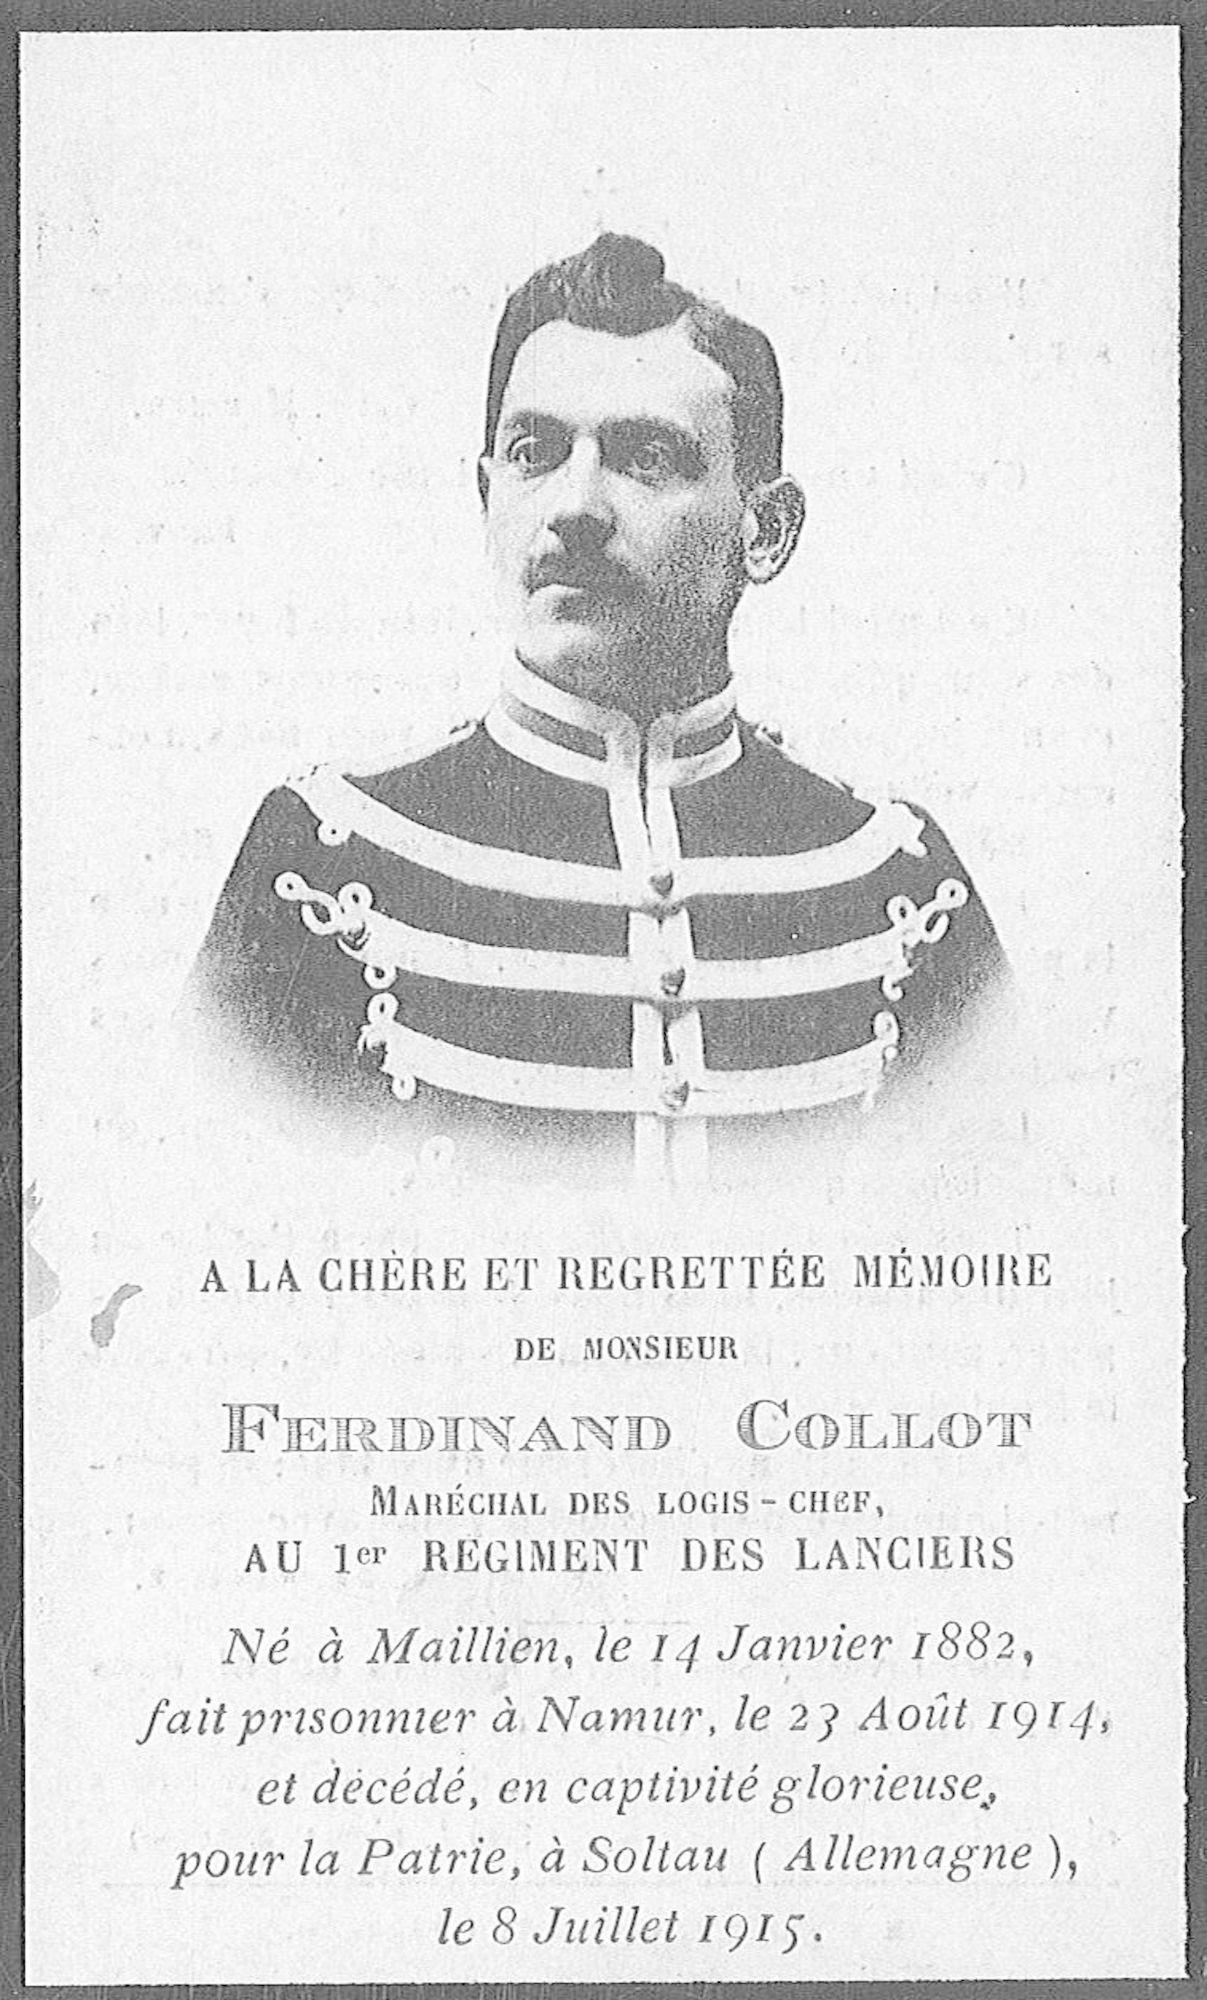 Ferdinand Collot